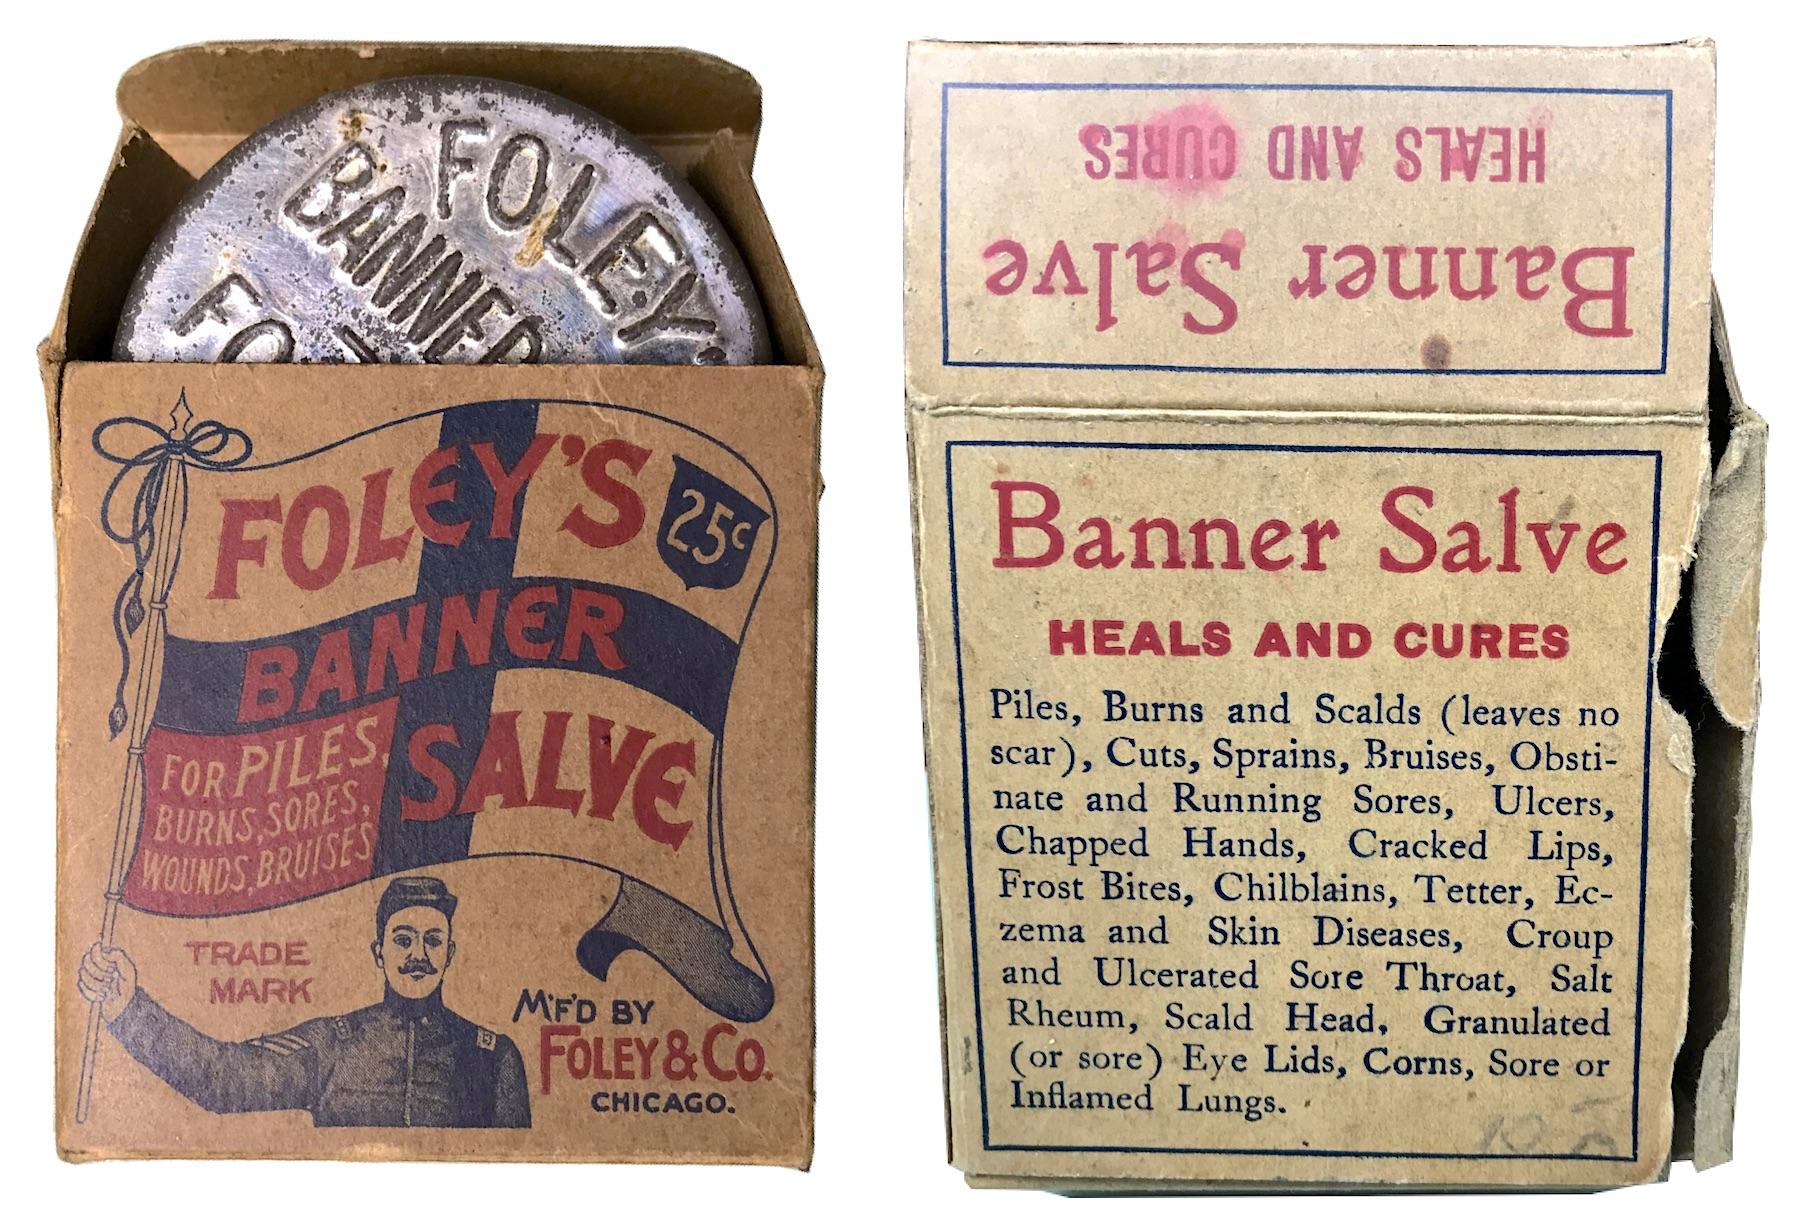 Foley's Banner Salve